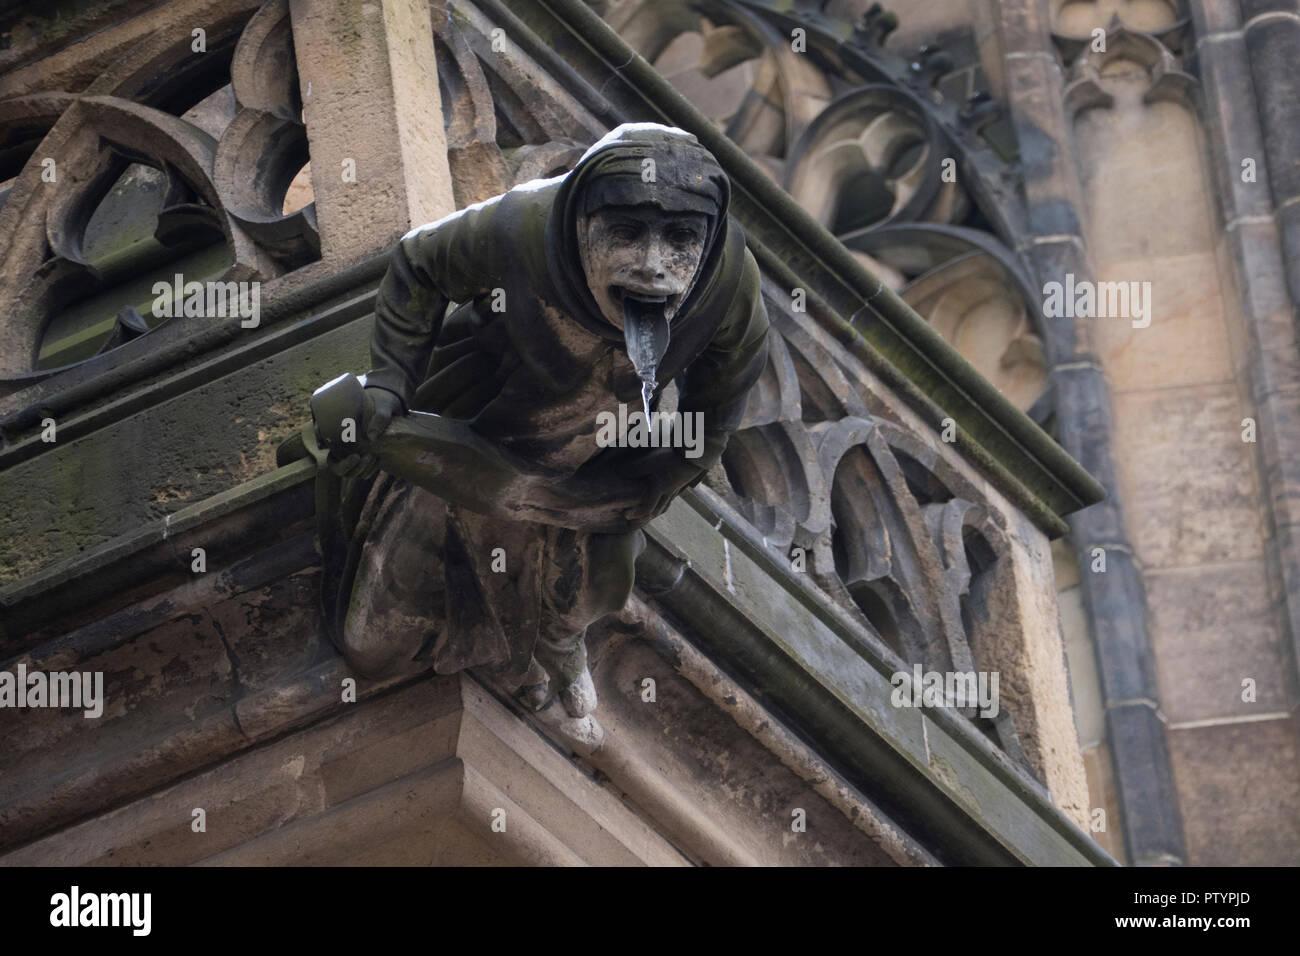 A gargoyle at the Prague Castle - Pražský hrad Prague, Czech Republic. Stock Photo